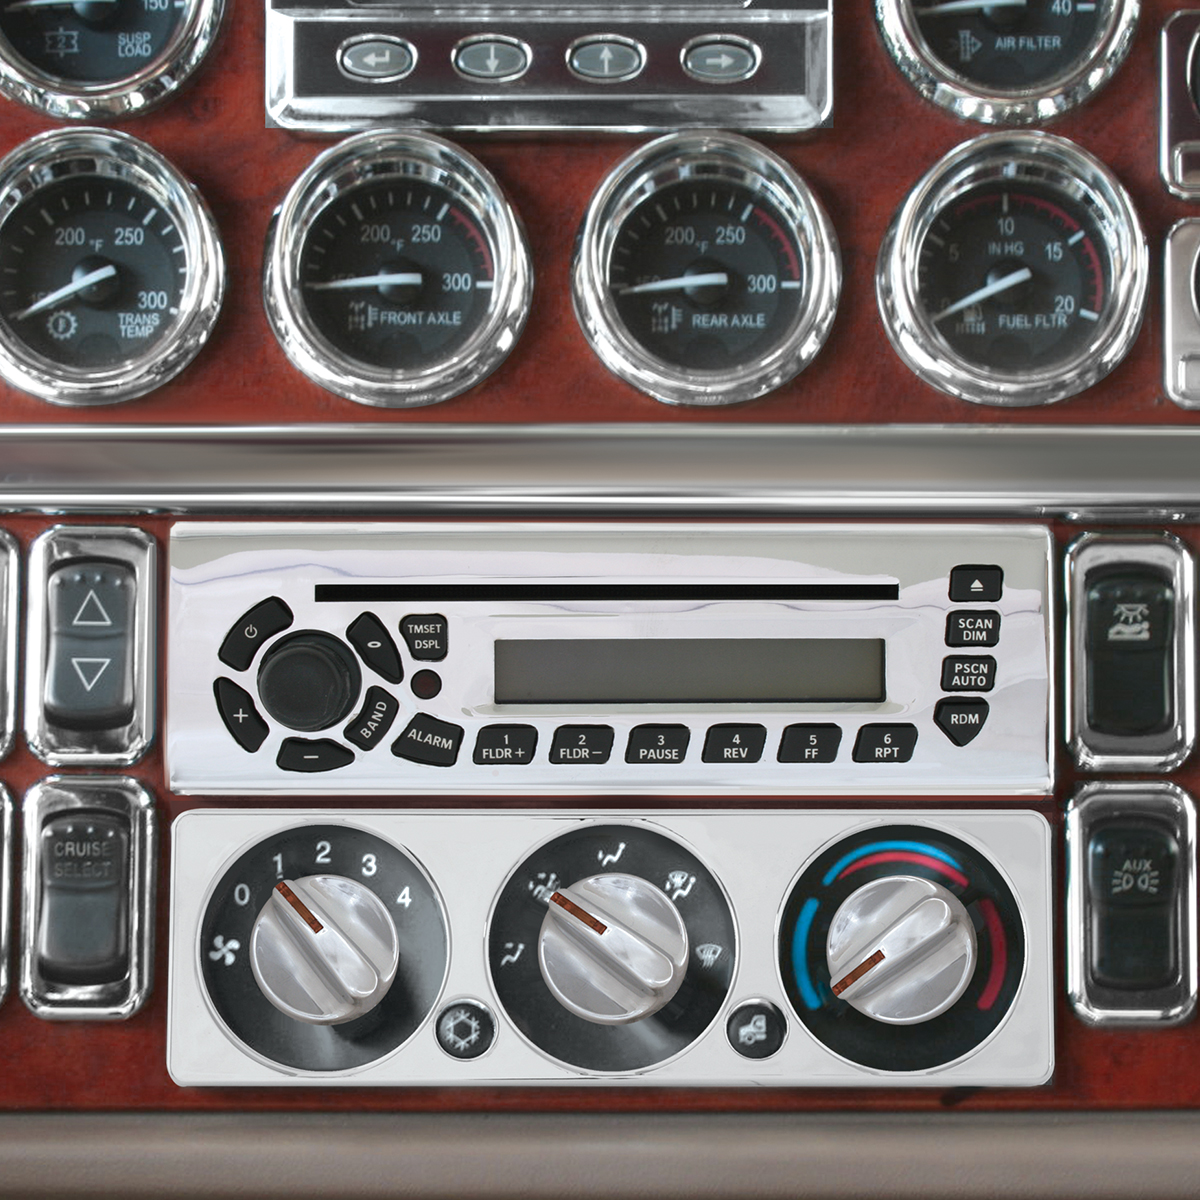 68348 Radio Unit Face Plate Cover for Peterbilt